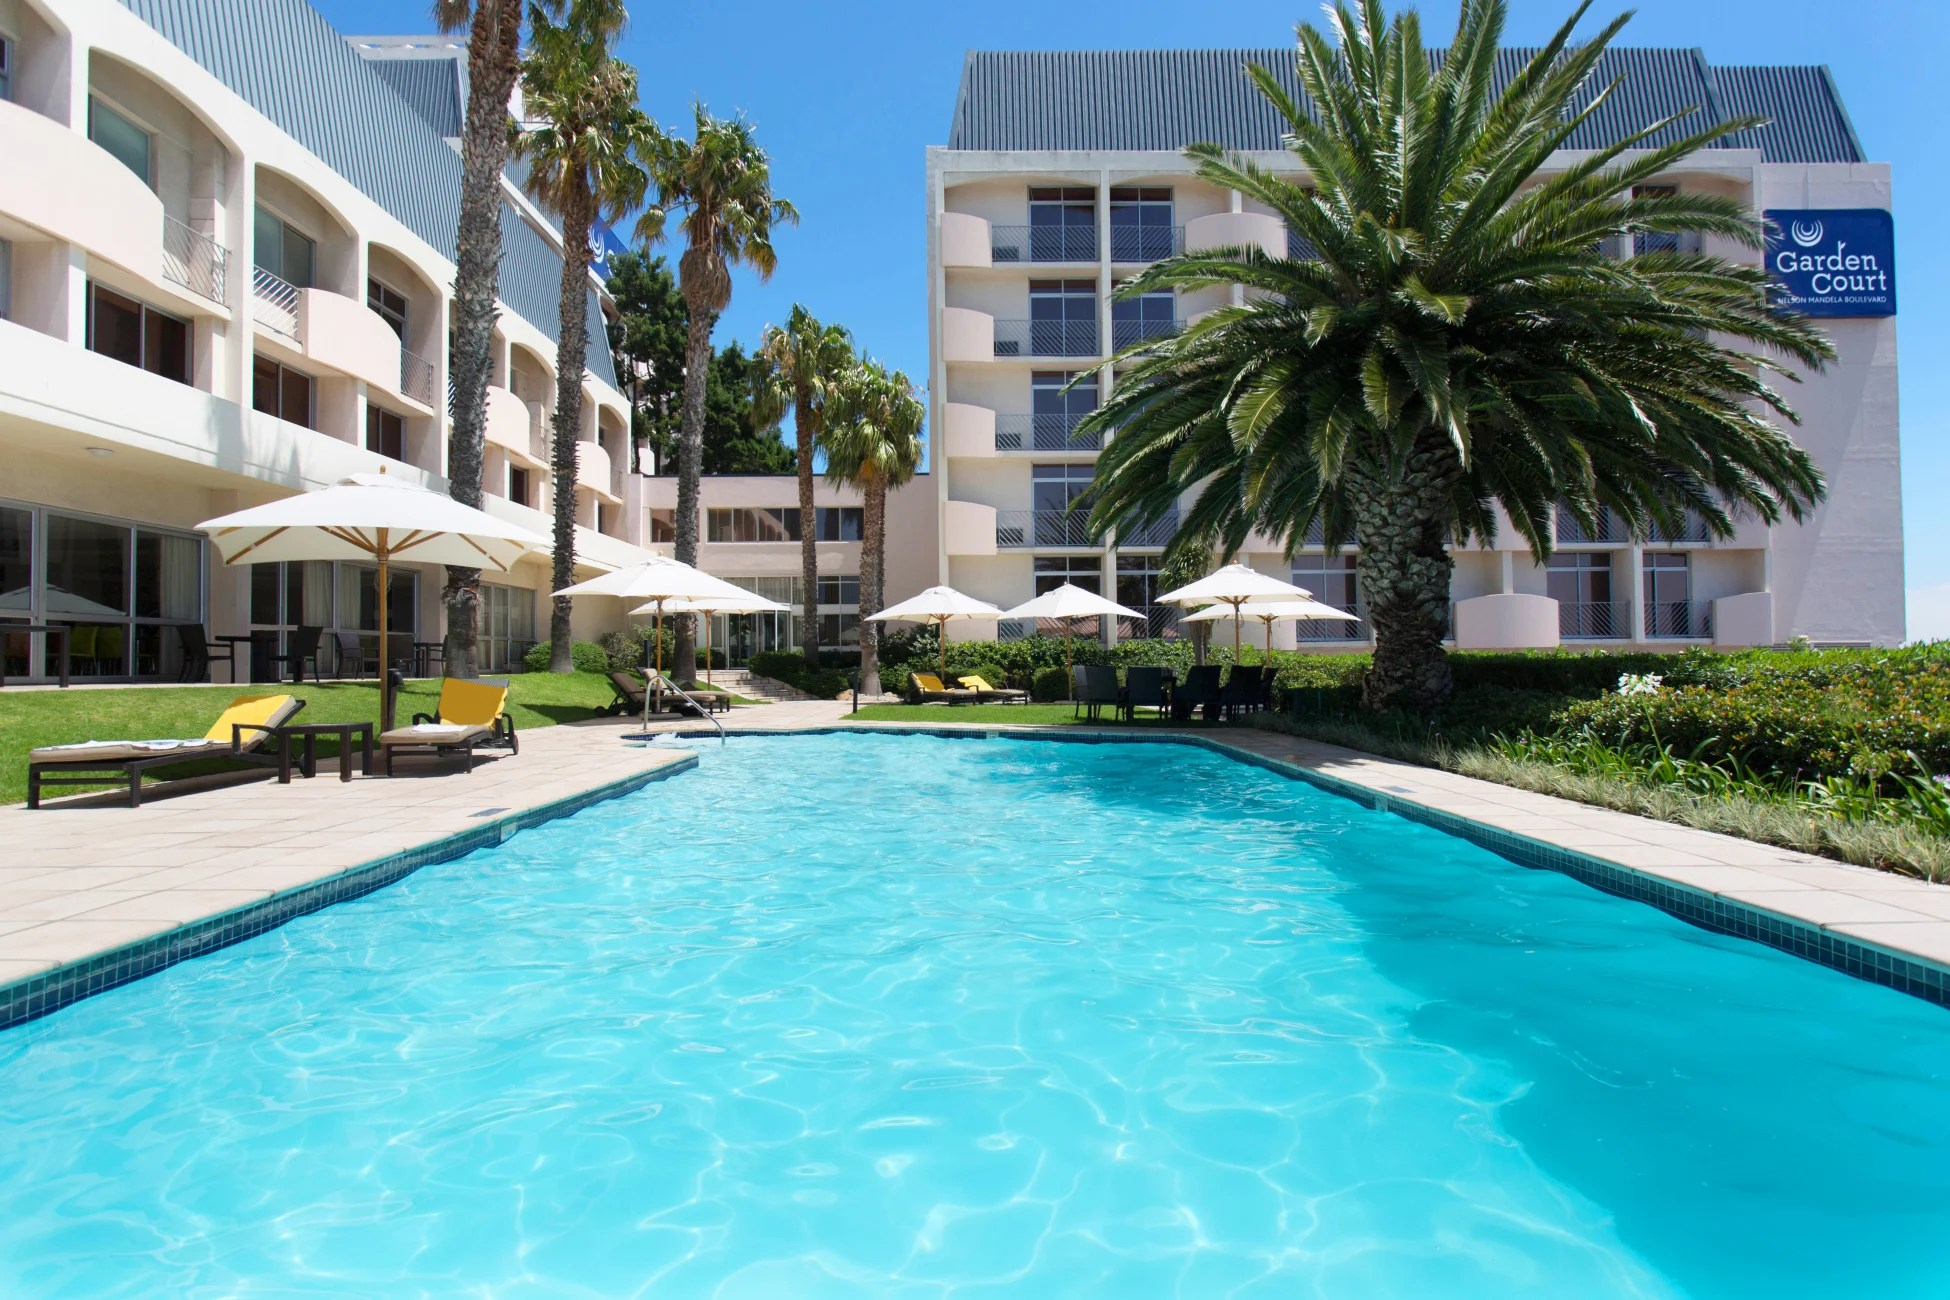 Hotel Garden Court Nelson Mandela Boulevard Cape Town